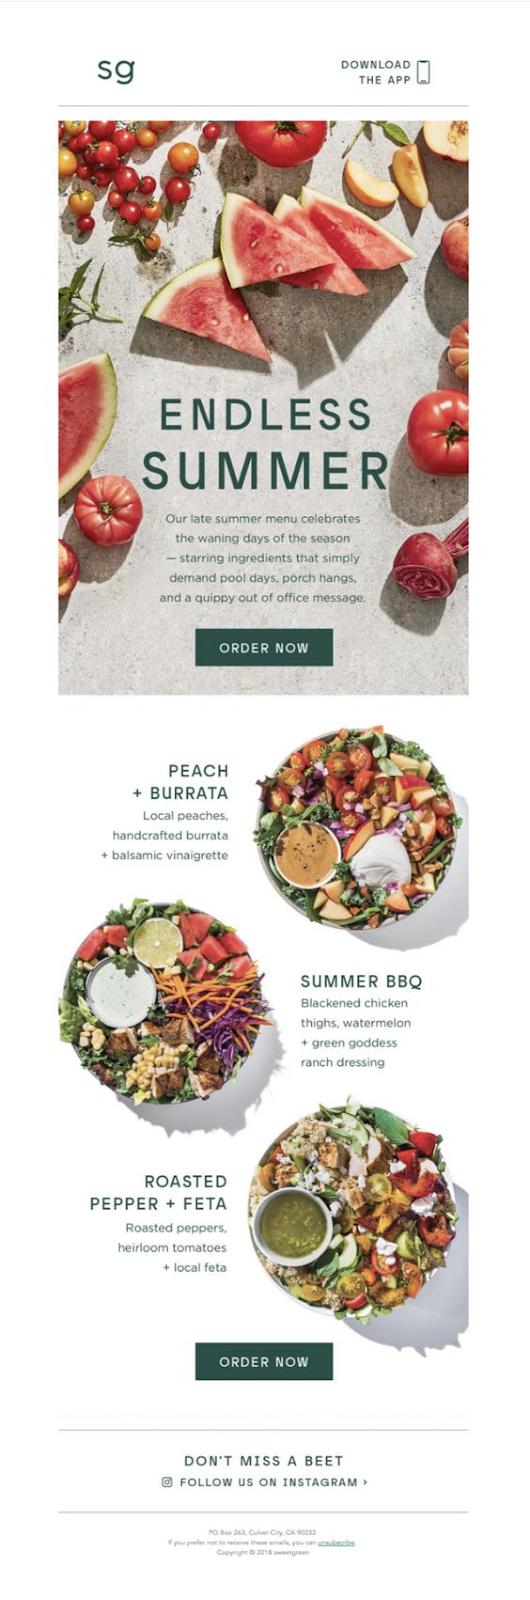 Restaurant menu updates email